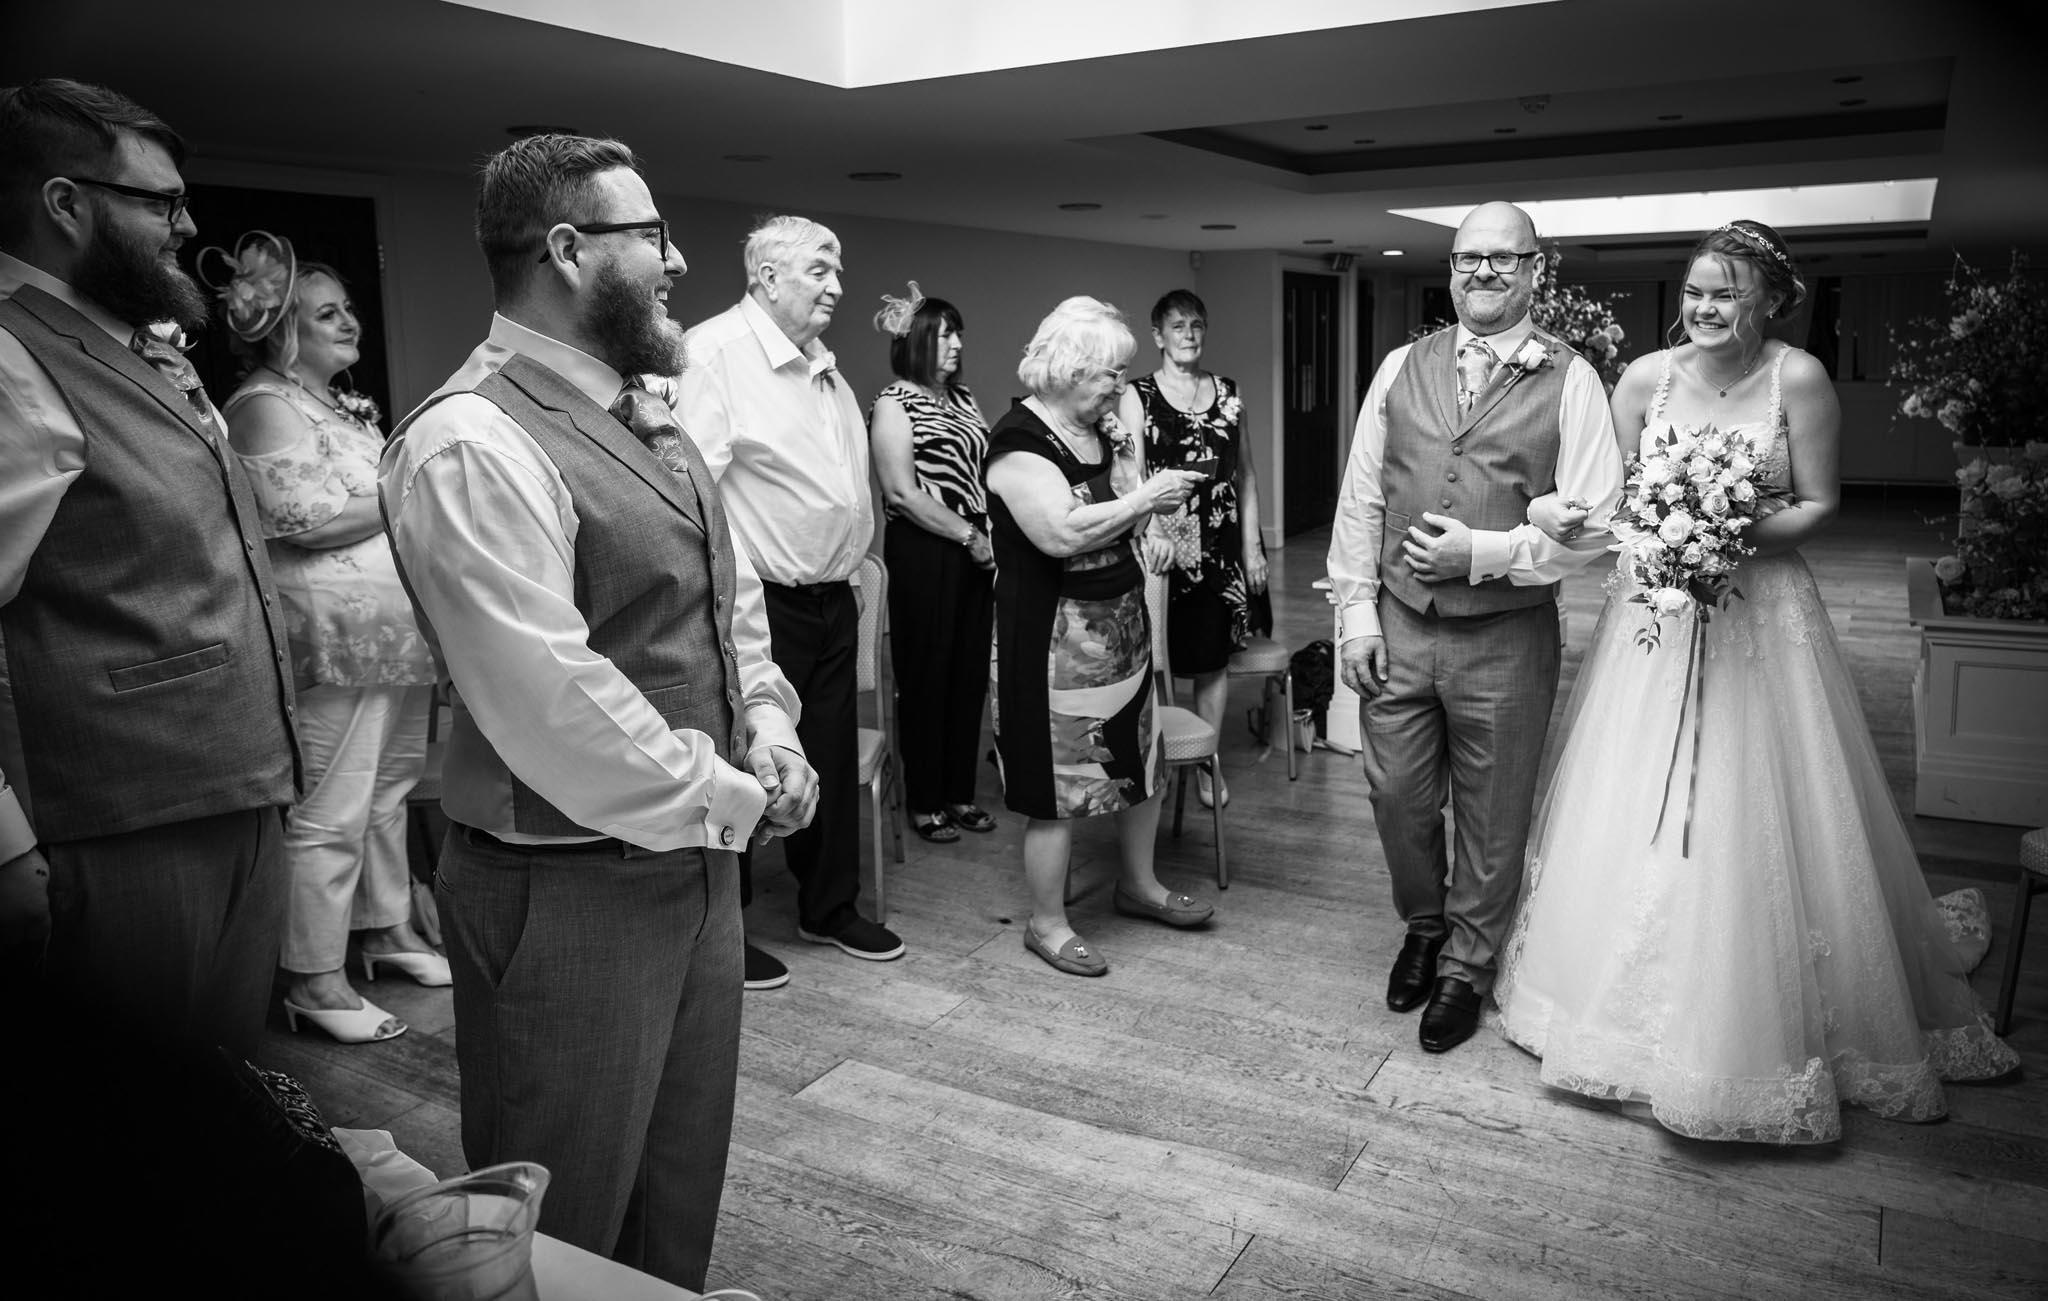 287-Ceremony-Luke-Yasmin-The-Rayleigh-Club-Wedding-Photography.jpg